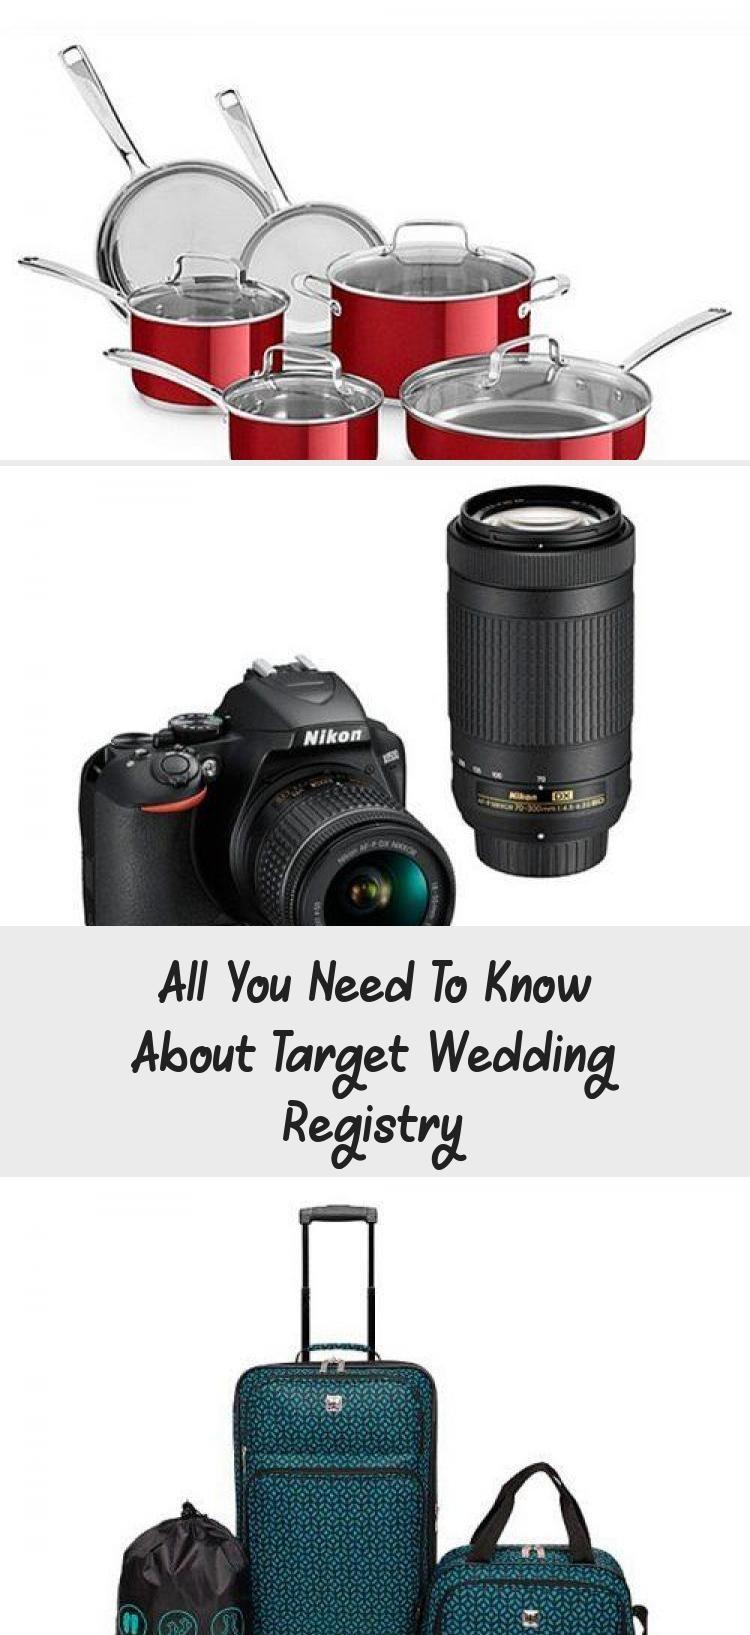 Target Wedding Registry Checklist Cheapweddingplanning Weddingplanningapps Quickweddingplanning Fas In 2020 Target Wedding Registry Wedding Registry Target Wedding